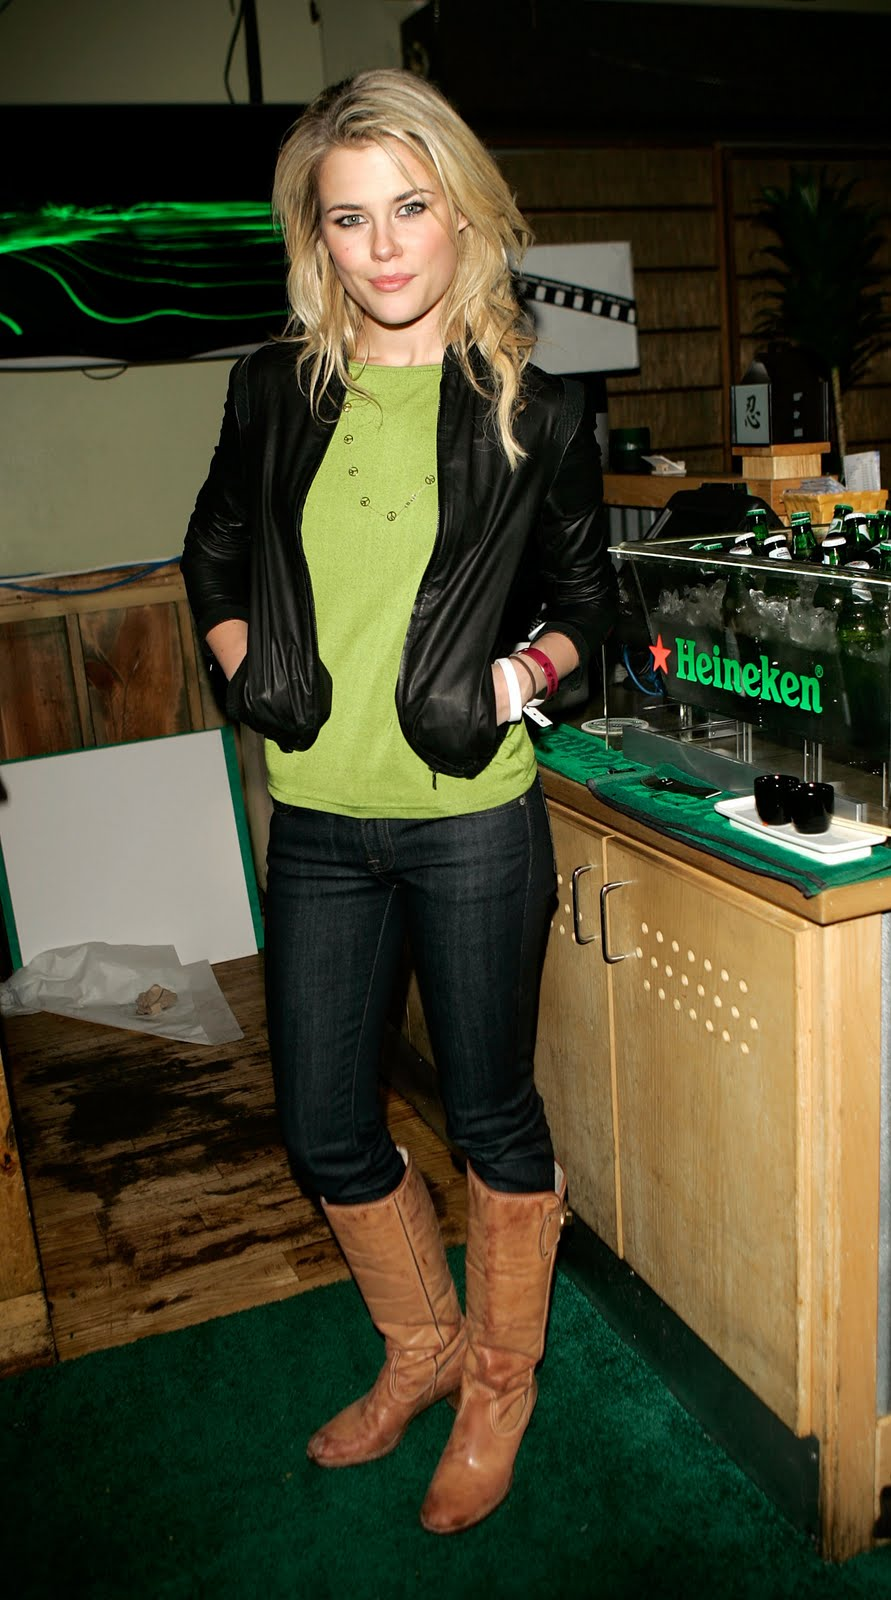 Rachael Taylor - HQ Pictures, Images, Photos